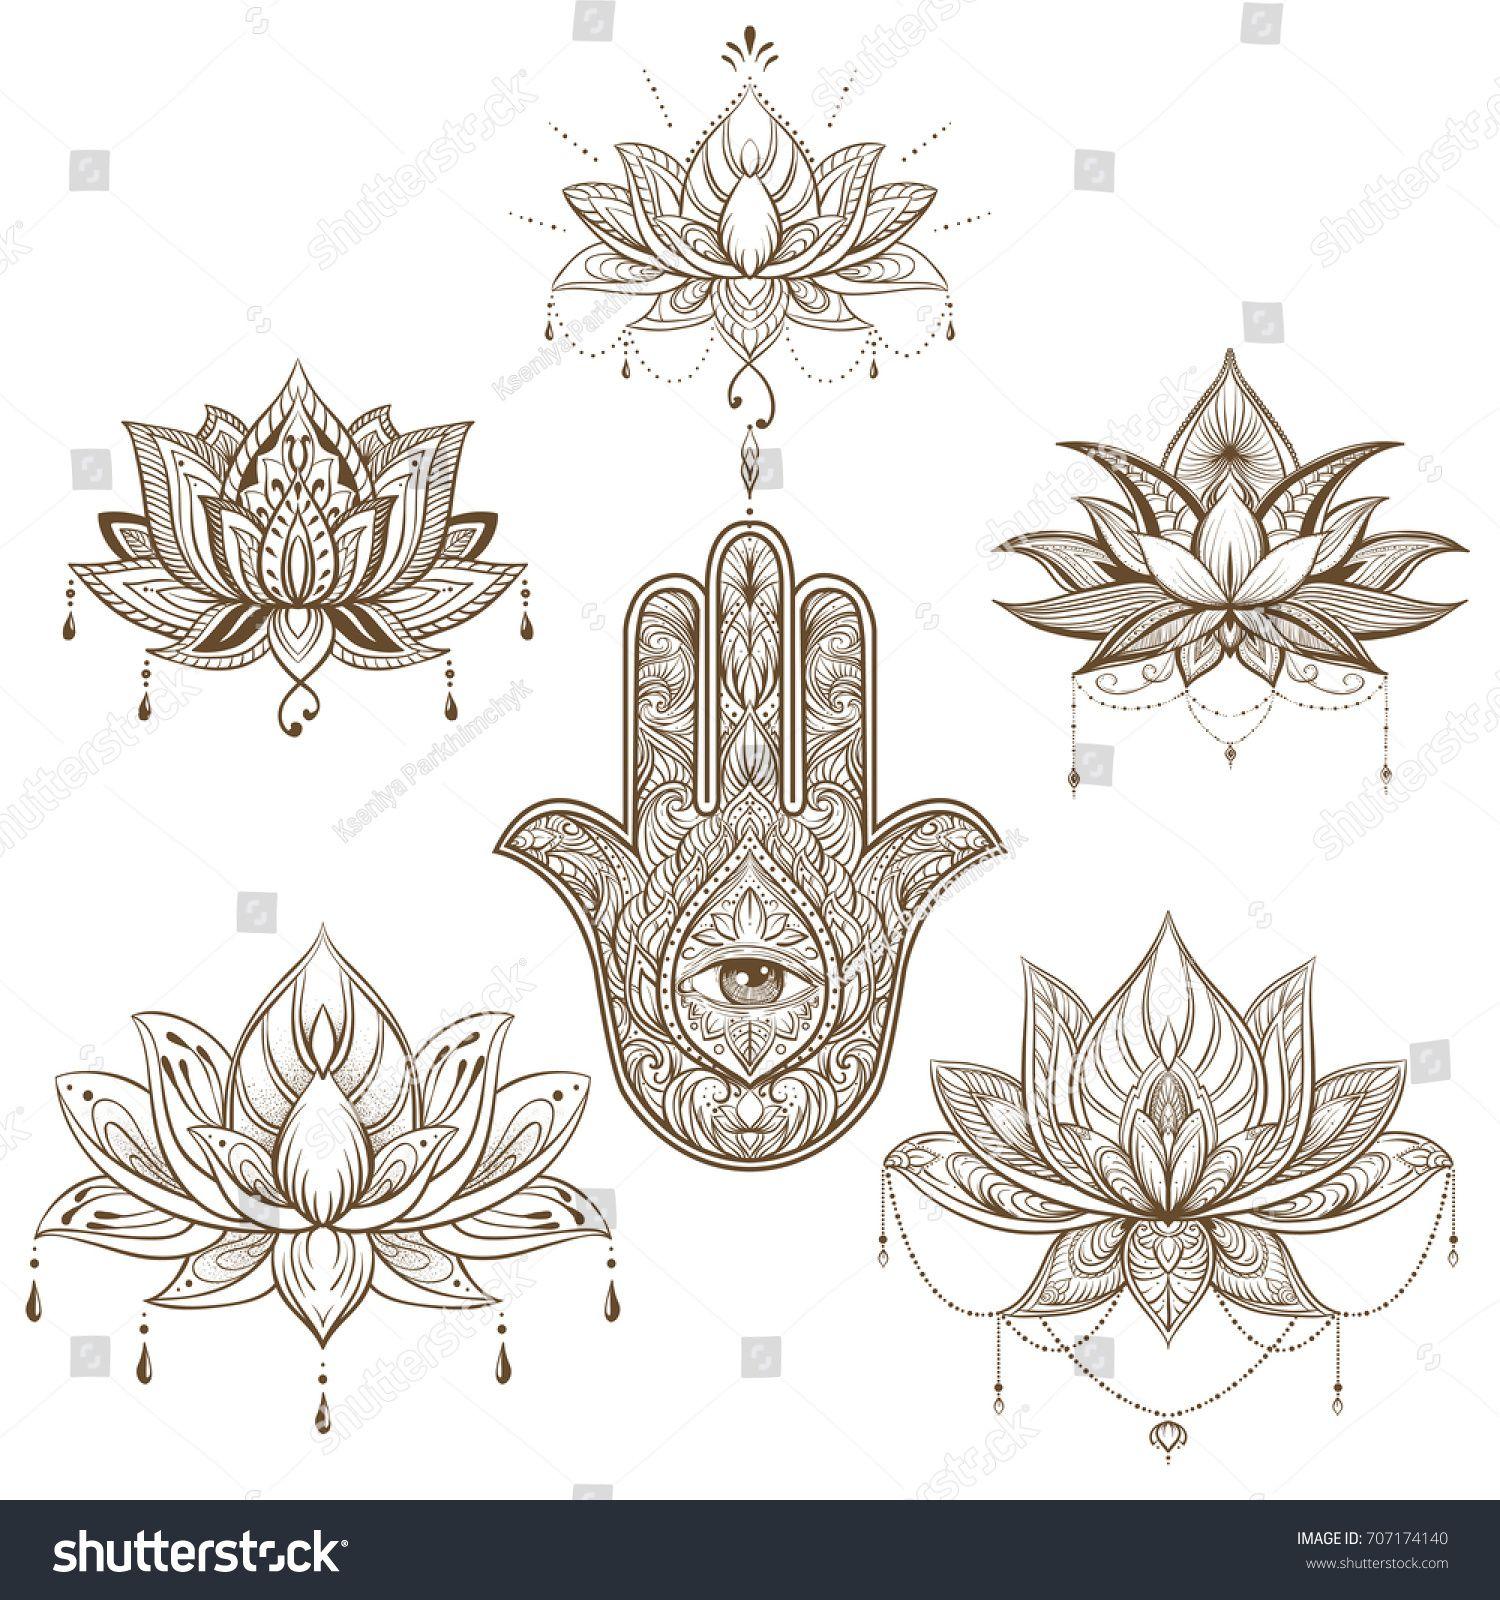 Lotus fllower und Hamsa Set. Vektorgrafik. Stock-Vektorgrafik (Lizenzfrei) 707174140